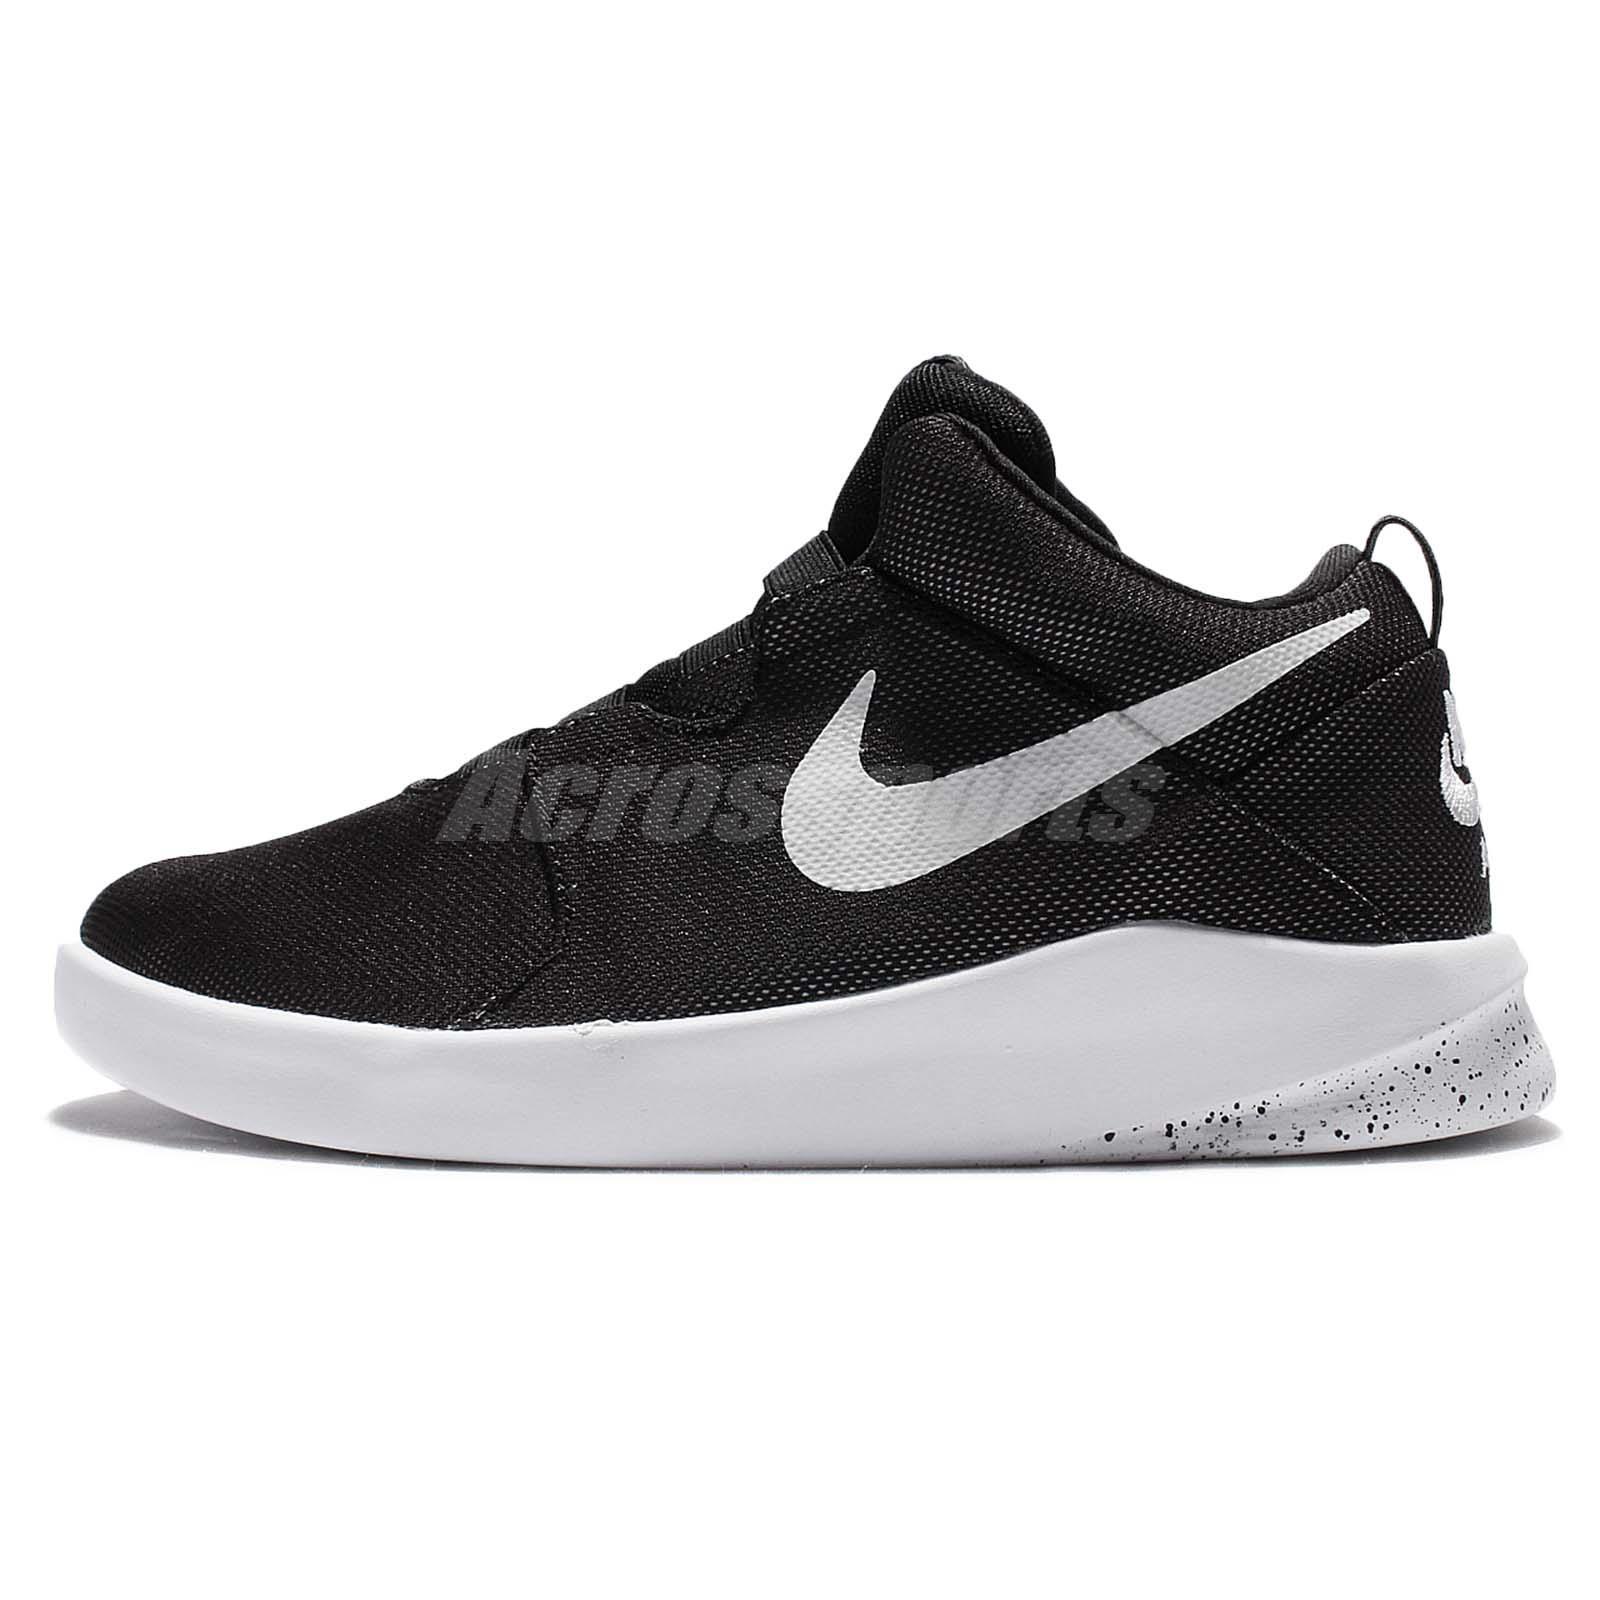 nike air shibusa black white mens casual shoes slip on